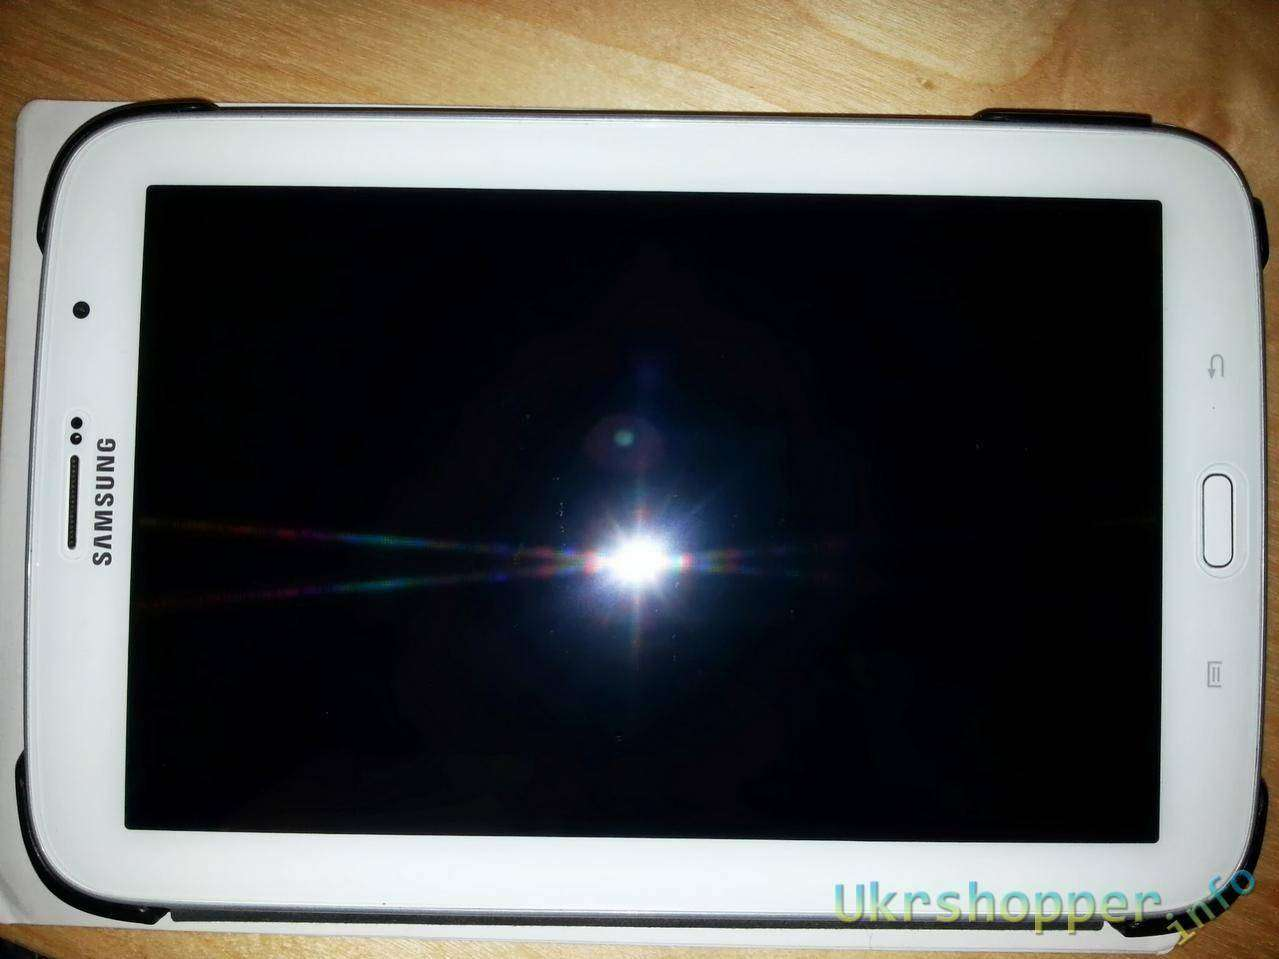 Aliexpress: Обзор защитного стекла для Samsung Galaxy Note 8.0